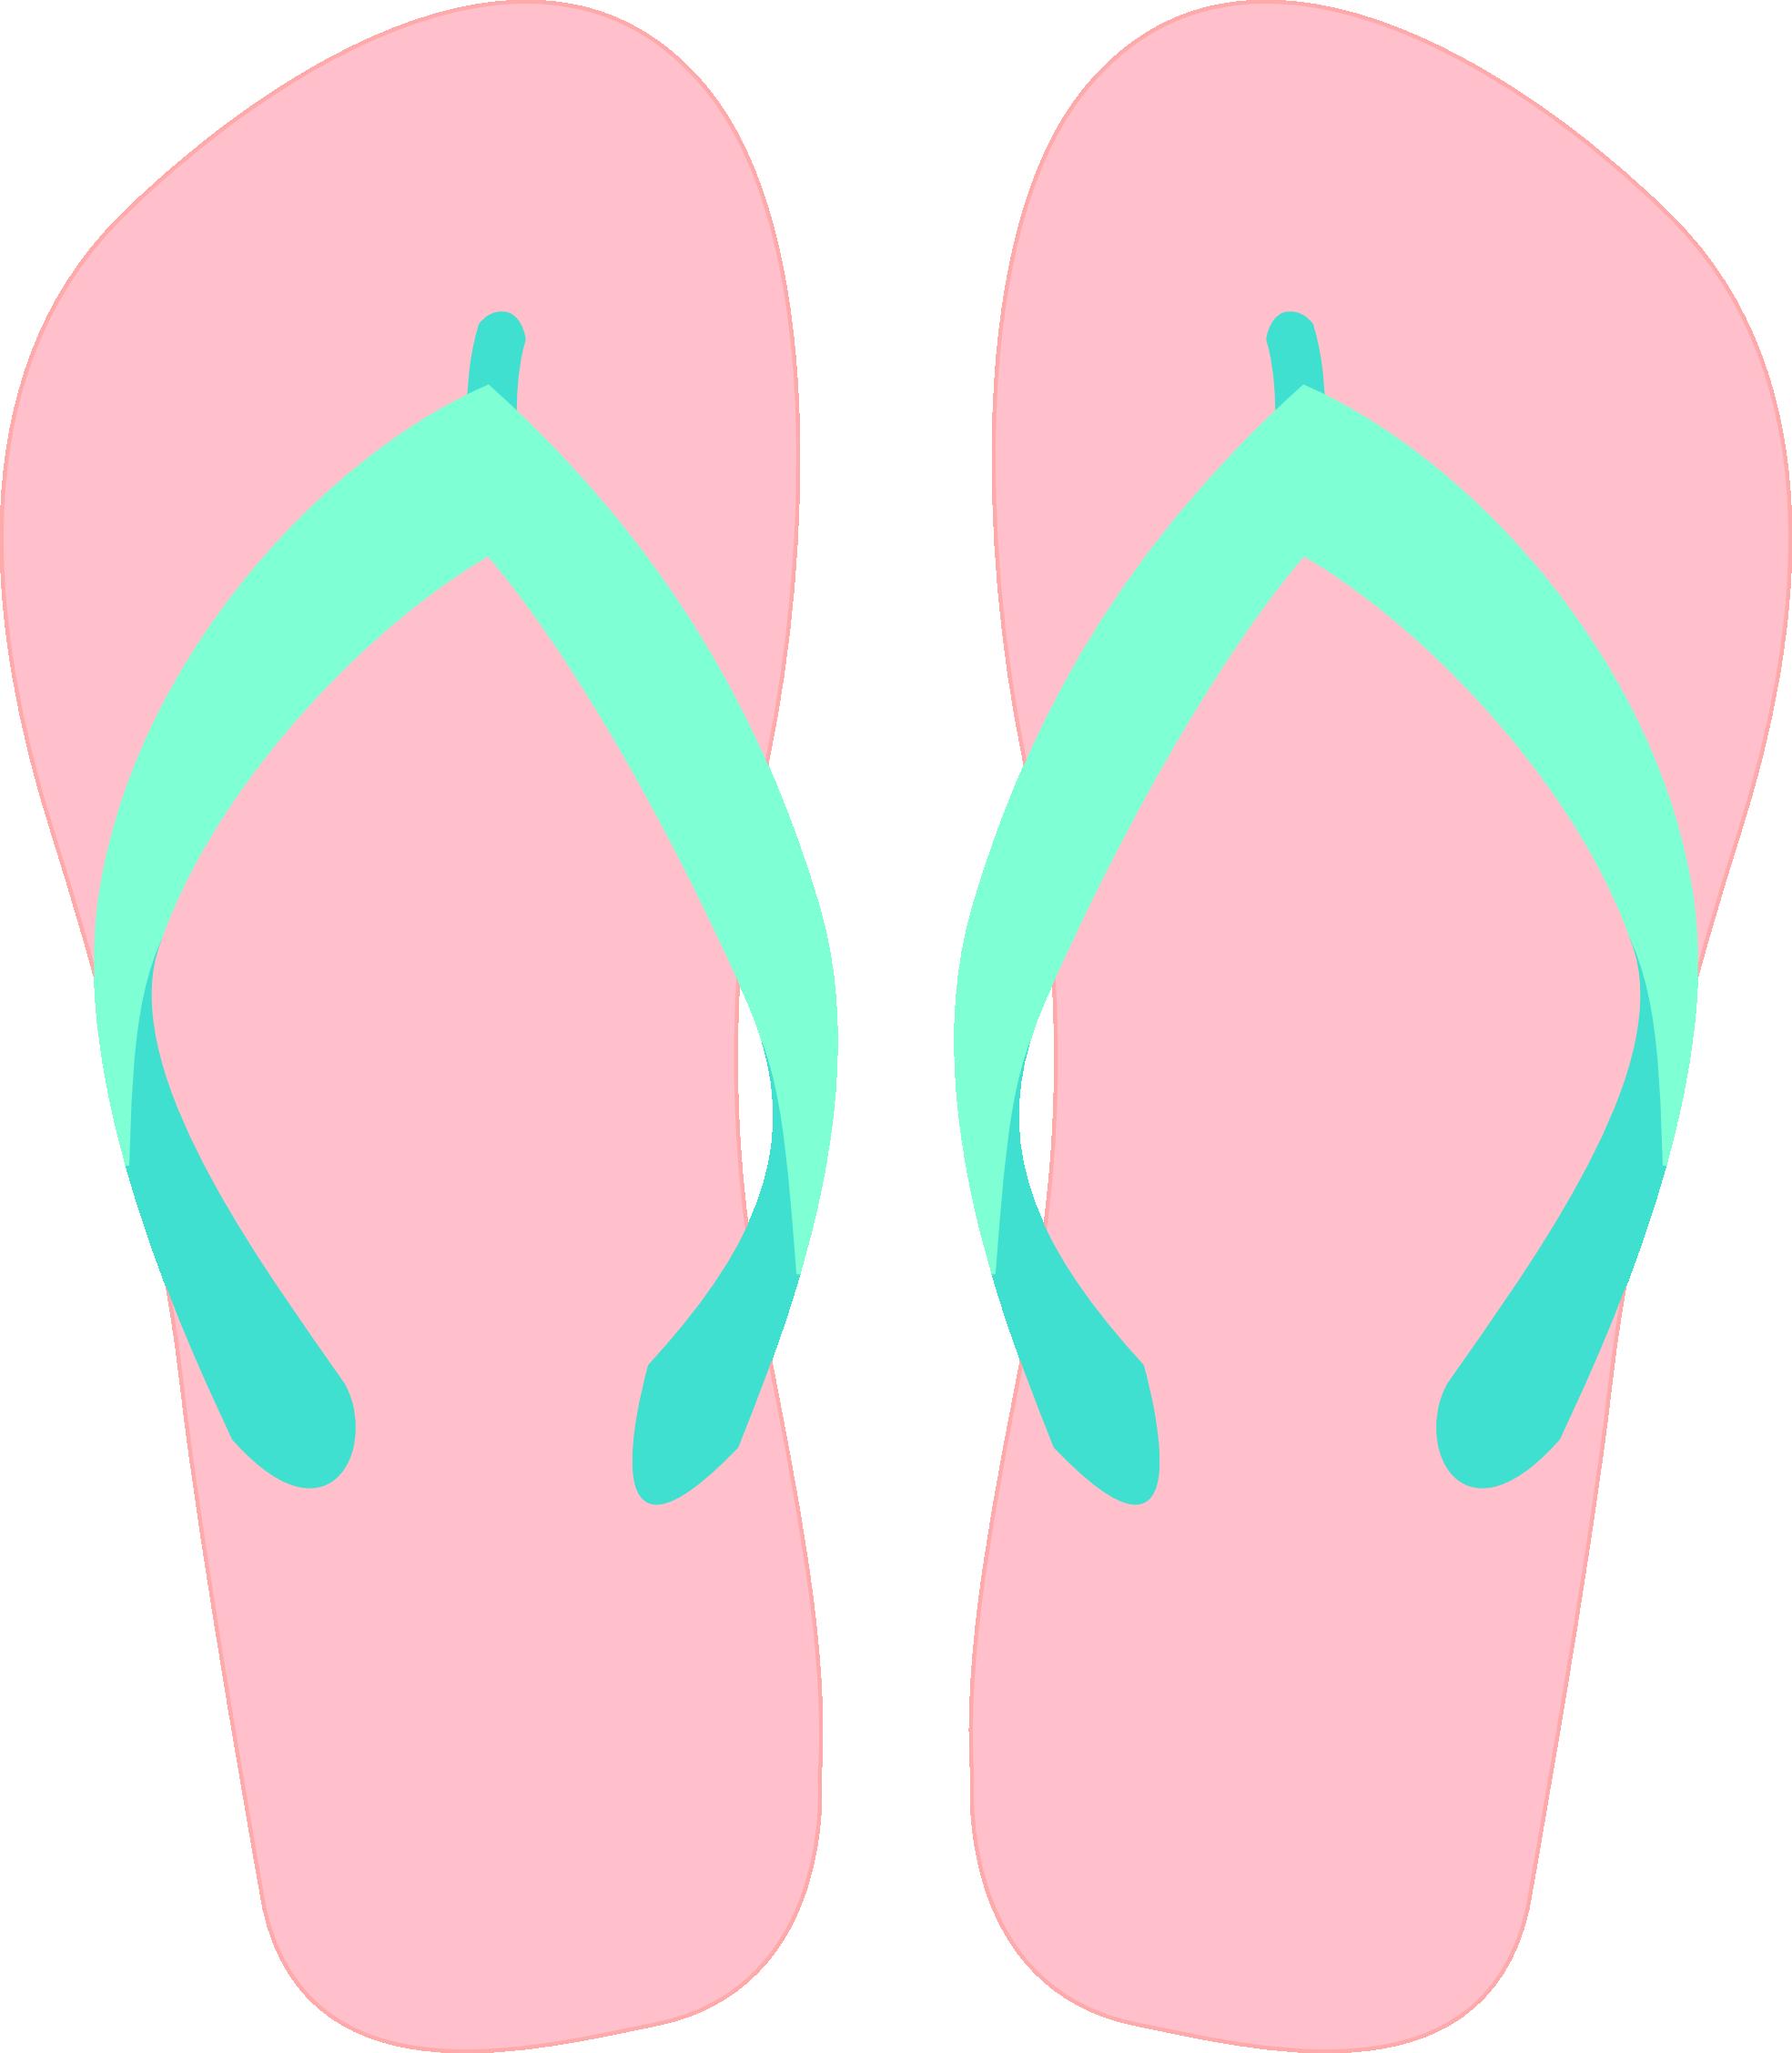 Hawaiian clipart flip flop. Graphics freeclip art havaianas